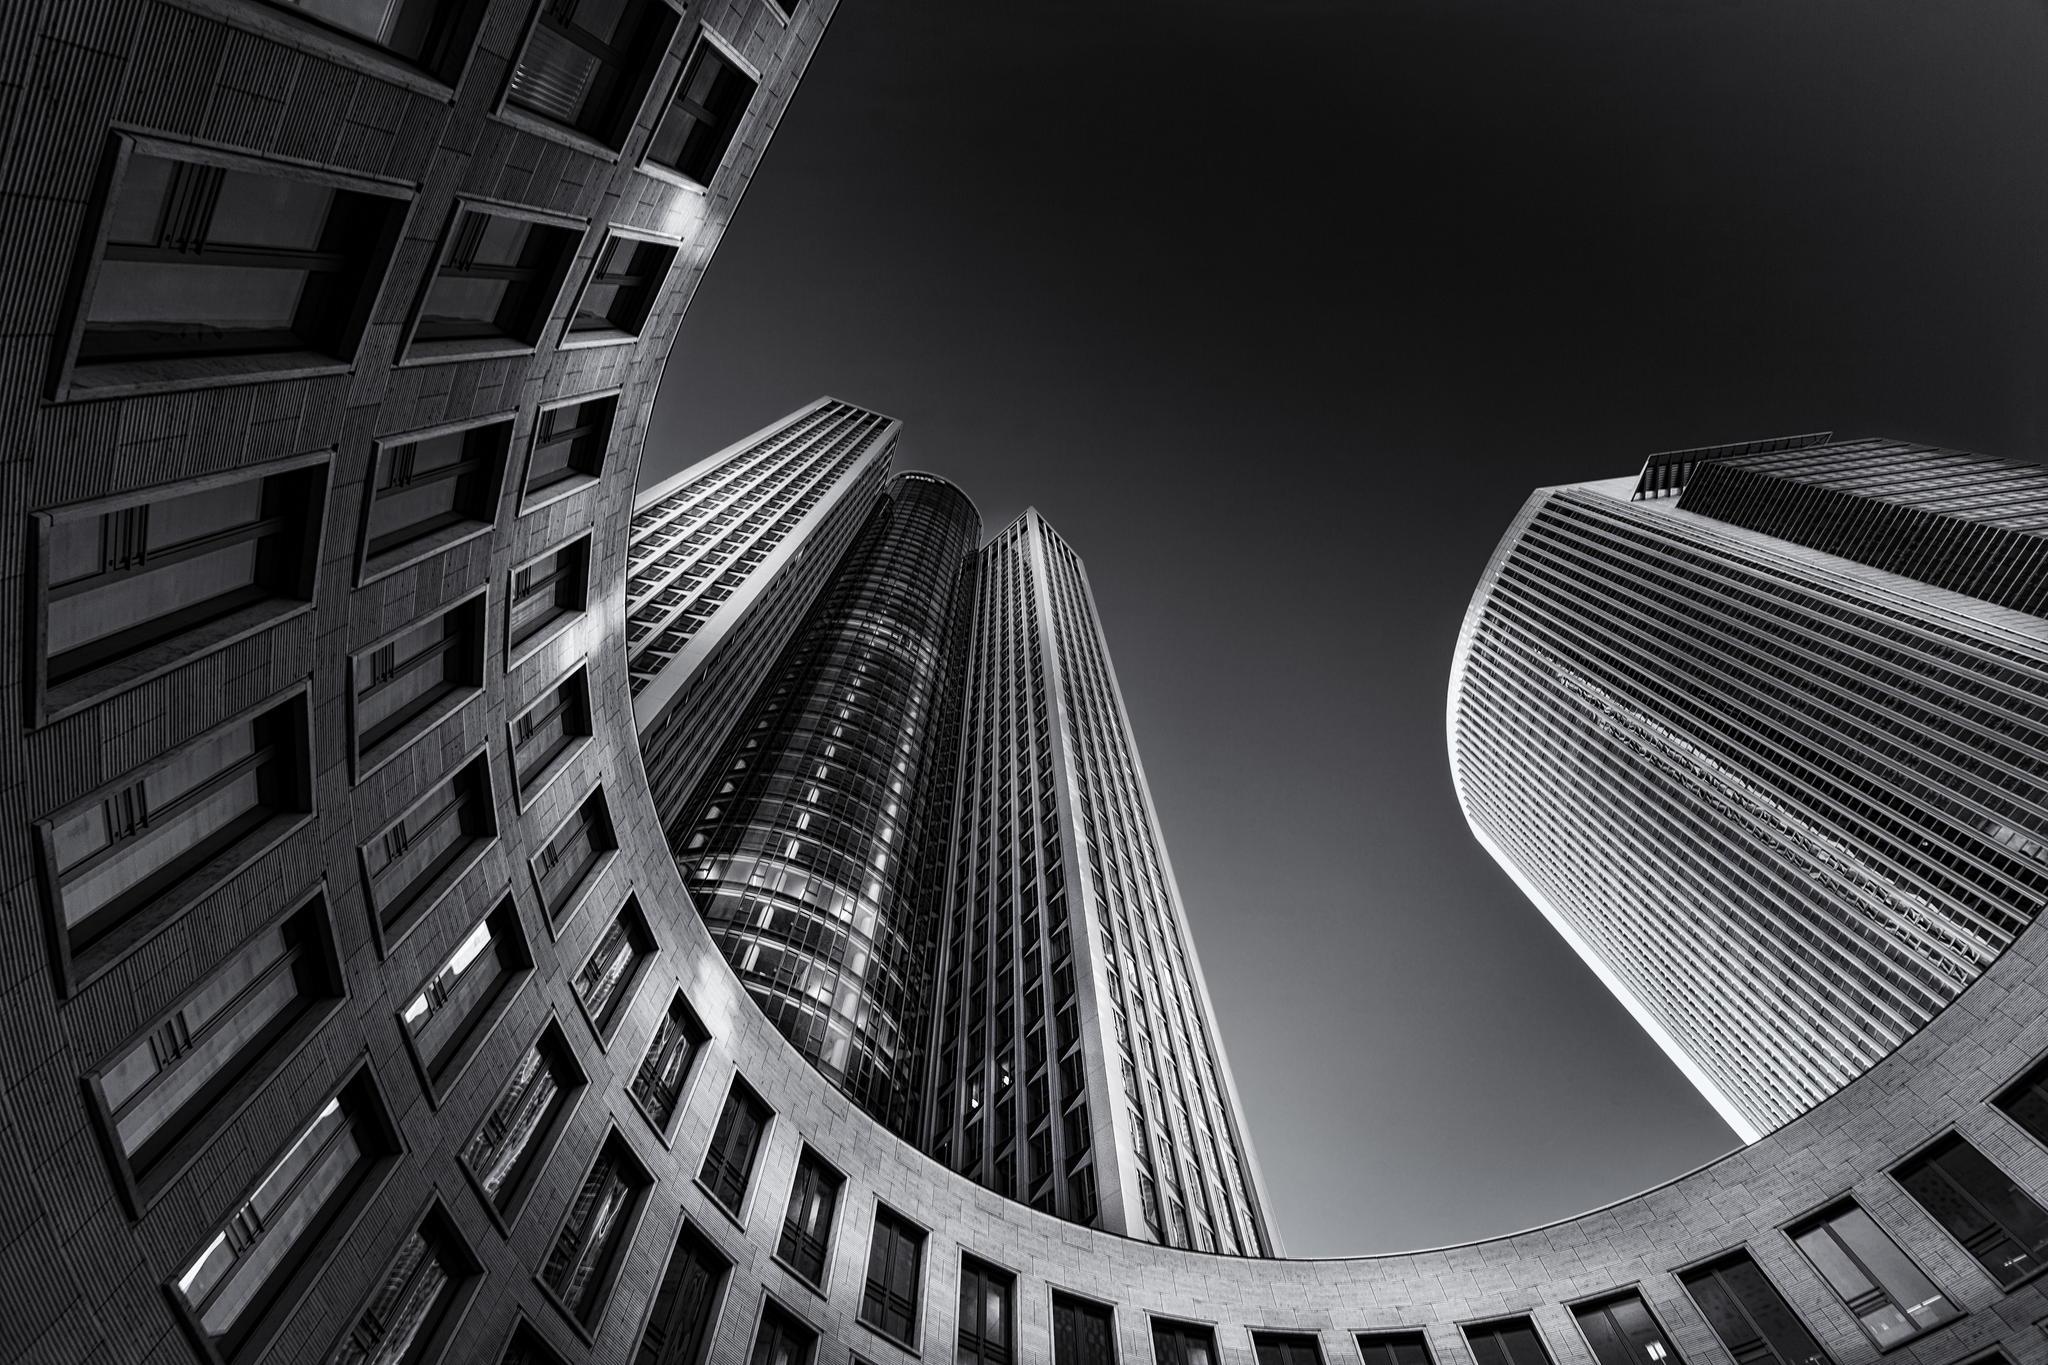 Blackandwhite black and white photography